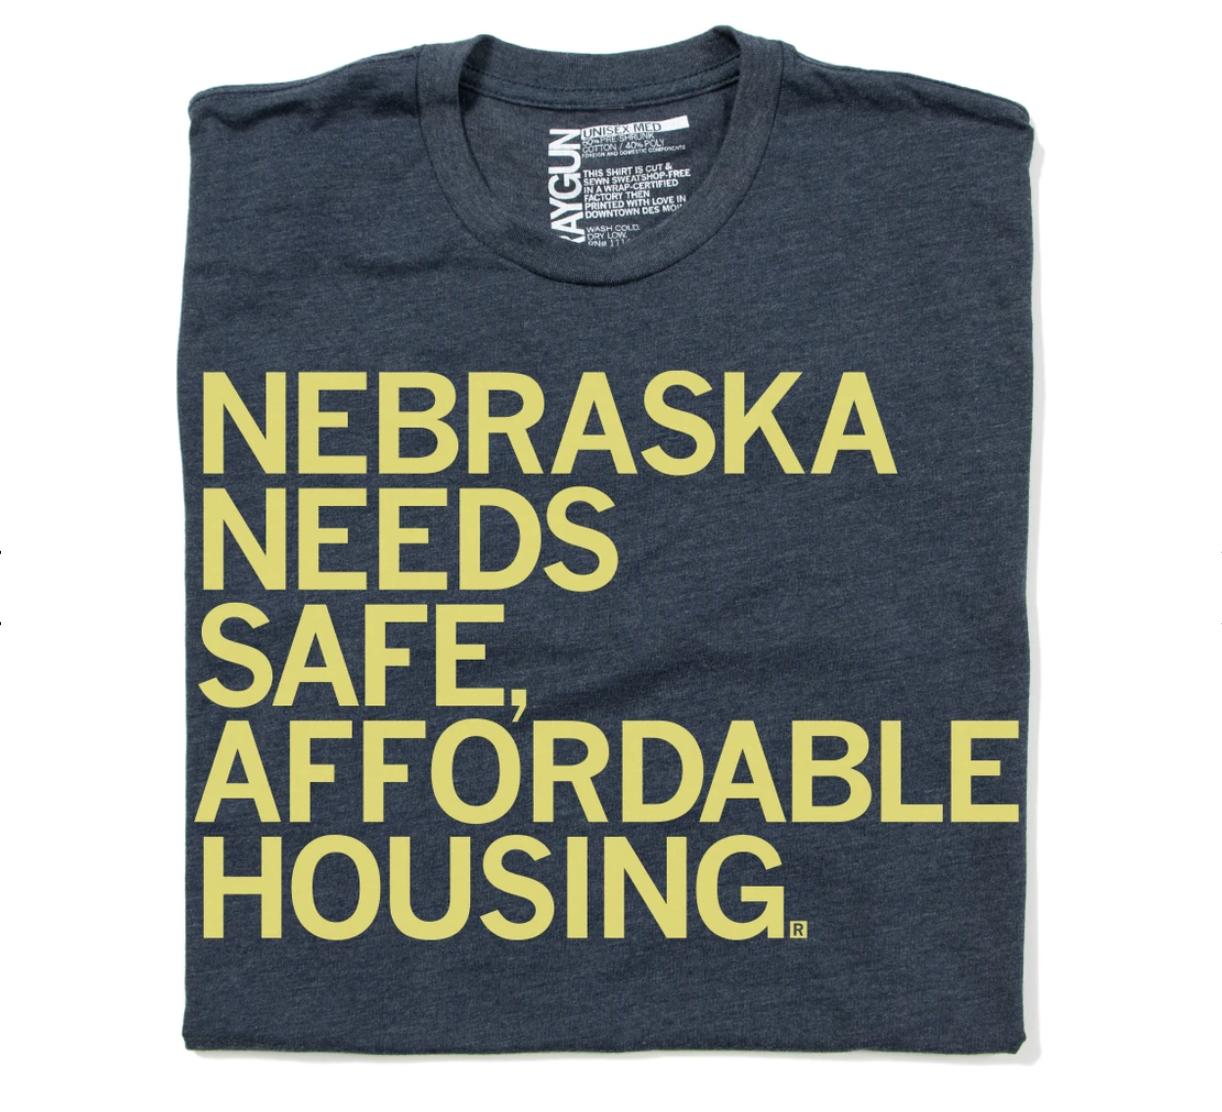 NE Needs Affordable Housing T-Shirts!